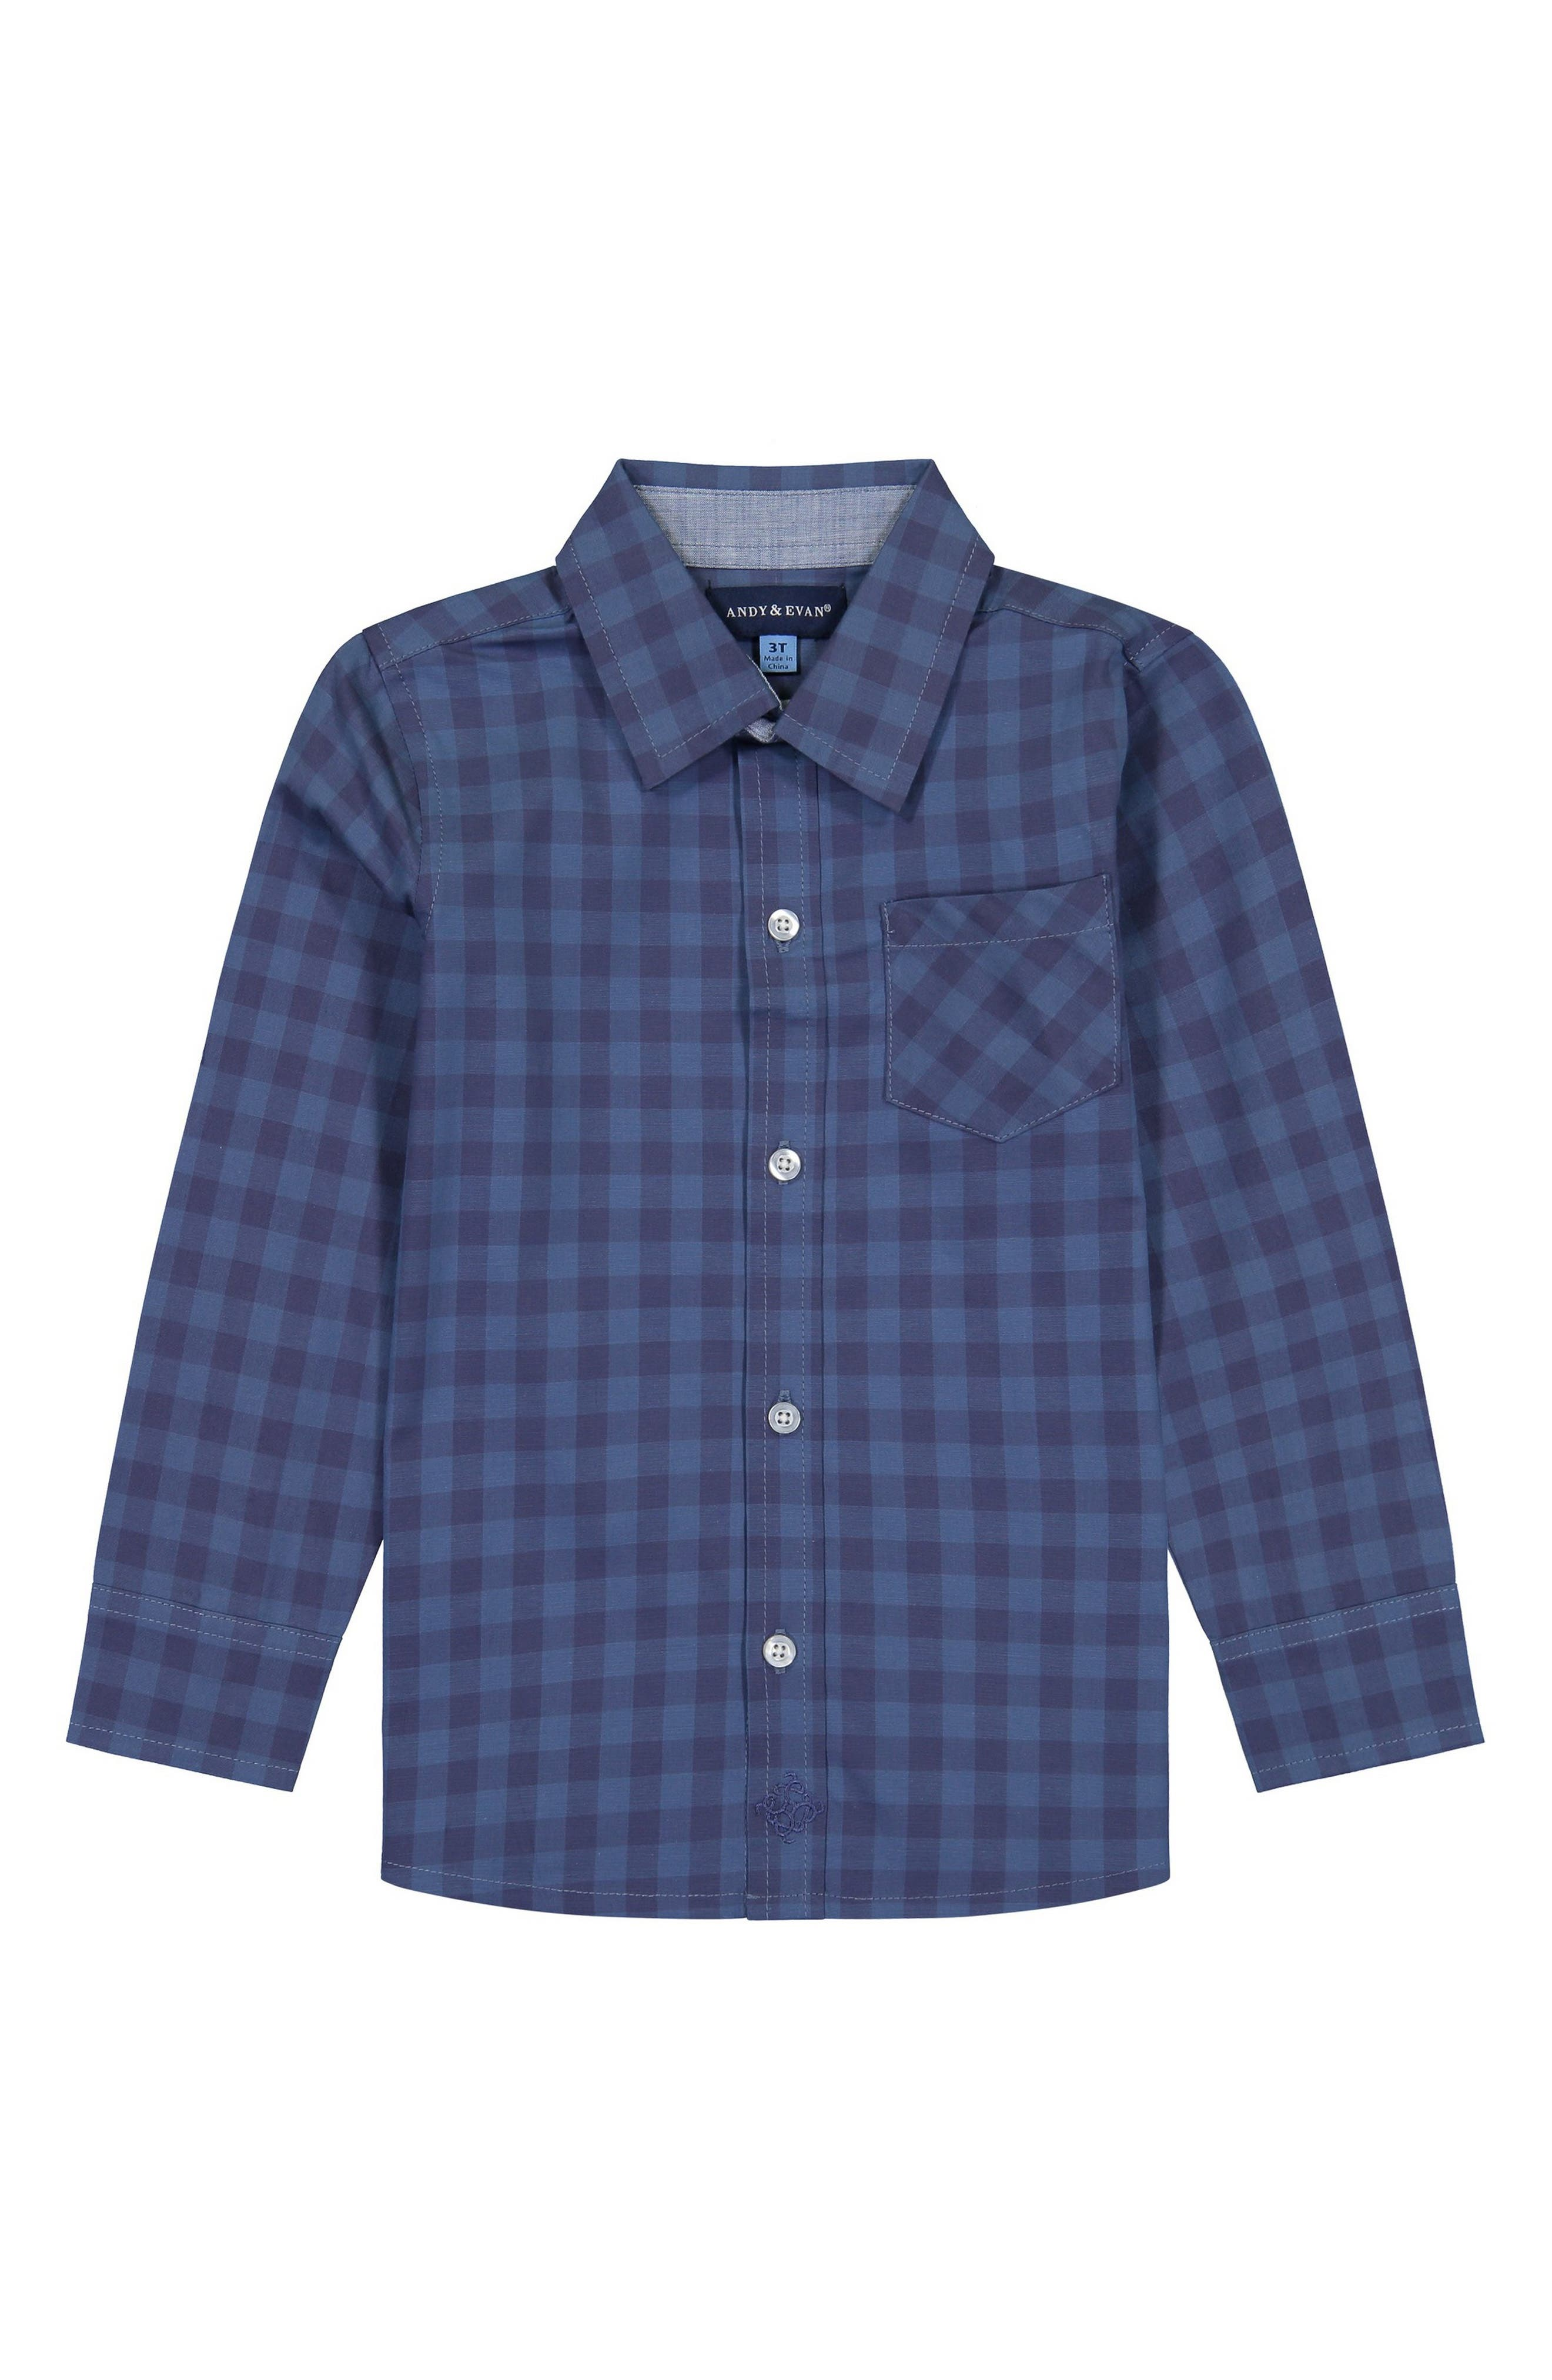 URMAGIC Boys Shirts Toddler Kids Plaid Blouse Button Tops Long Sleeve Casual Shirts Autumn Spring Clothes